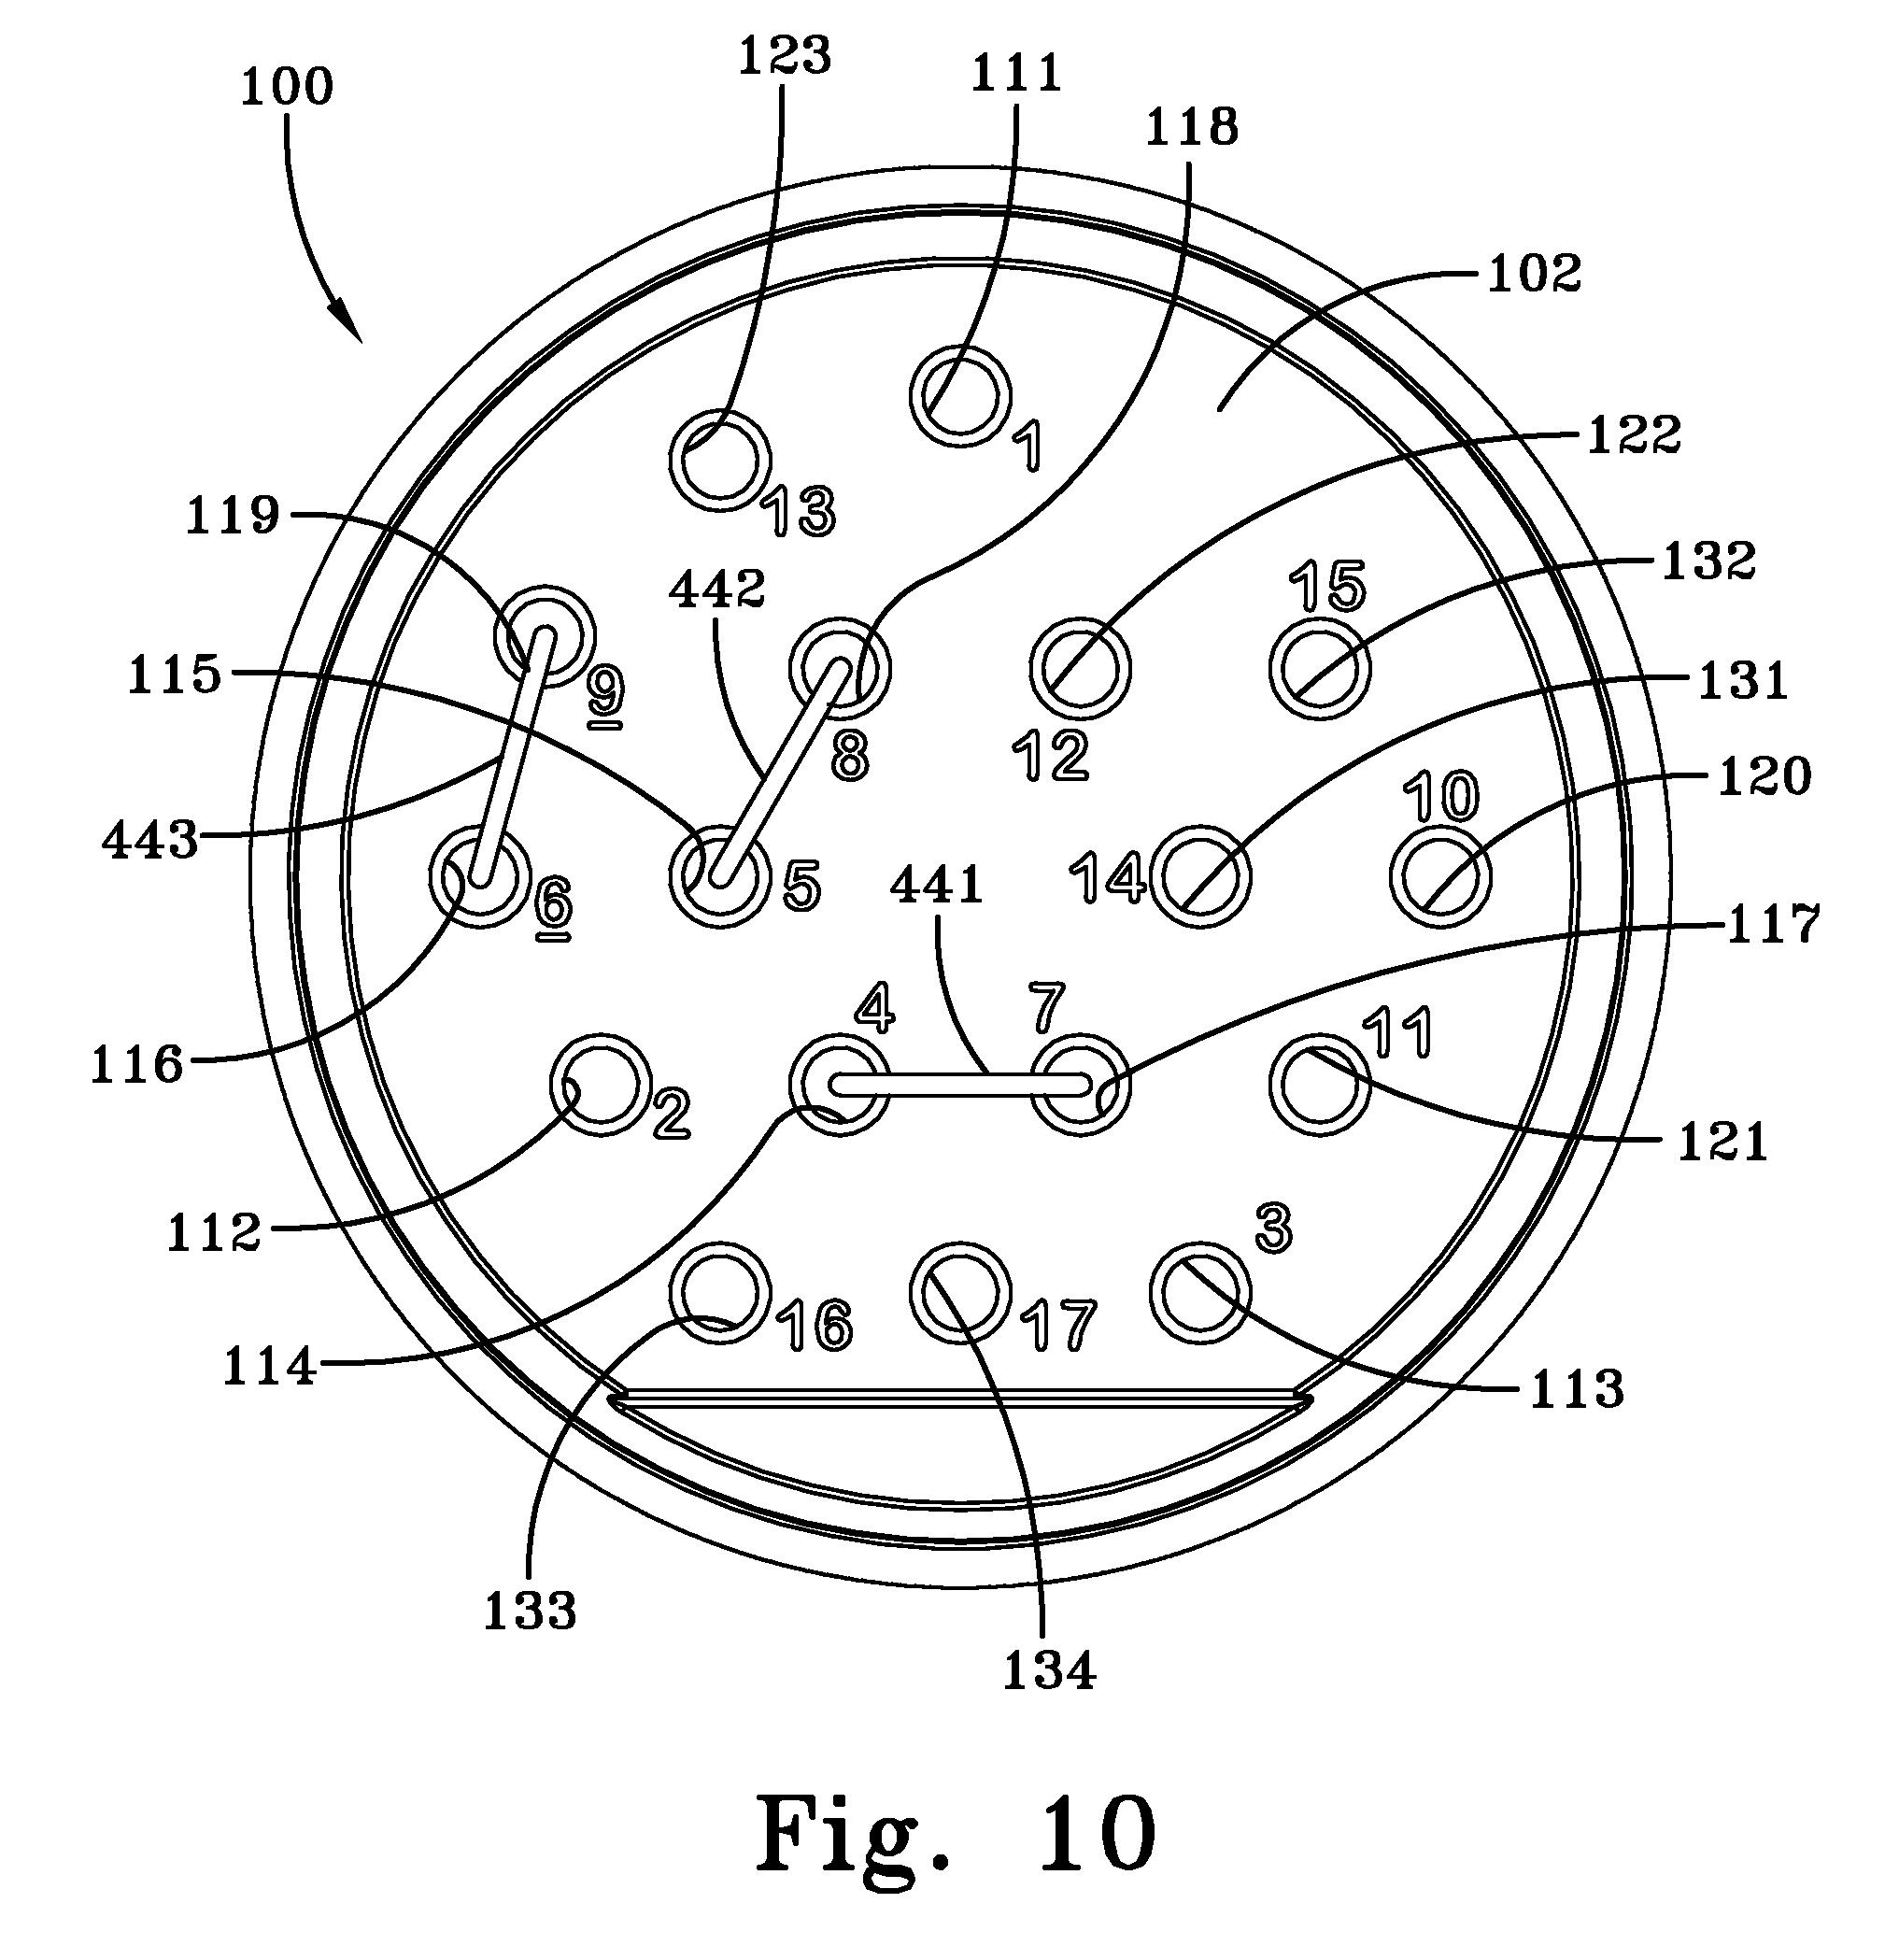 12 Lead Generator Wire Diagram - Great Installation Of Wiring Diagram • - 3 Phase Motor Wiring Diagram 12 Leads